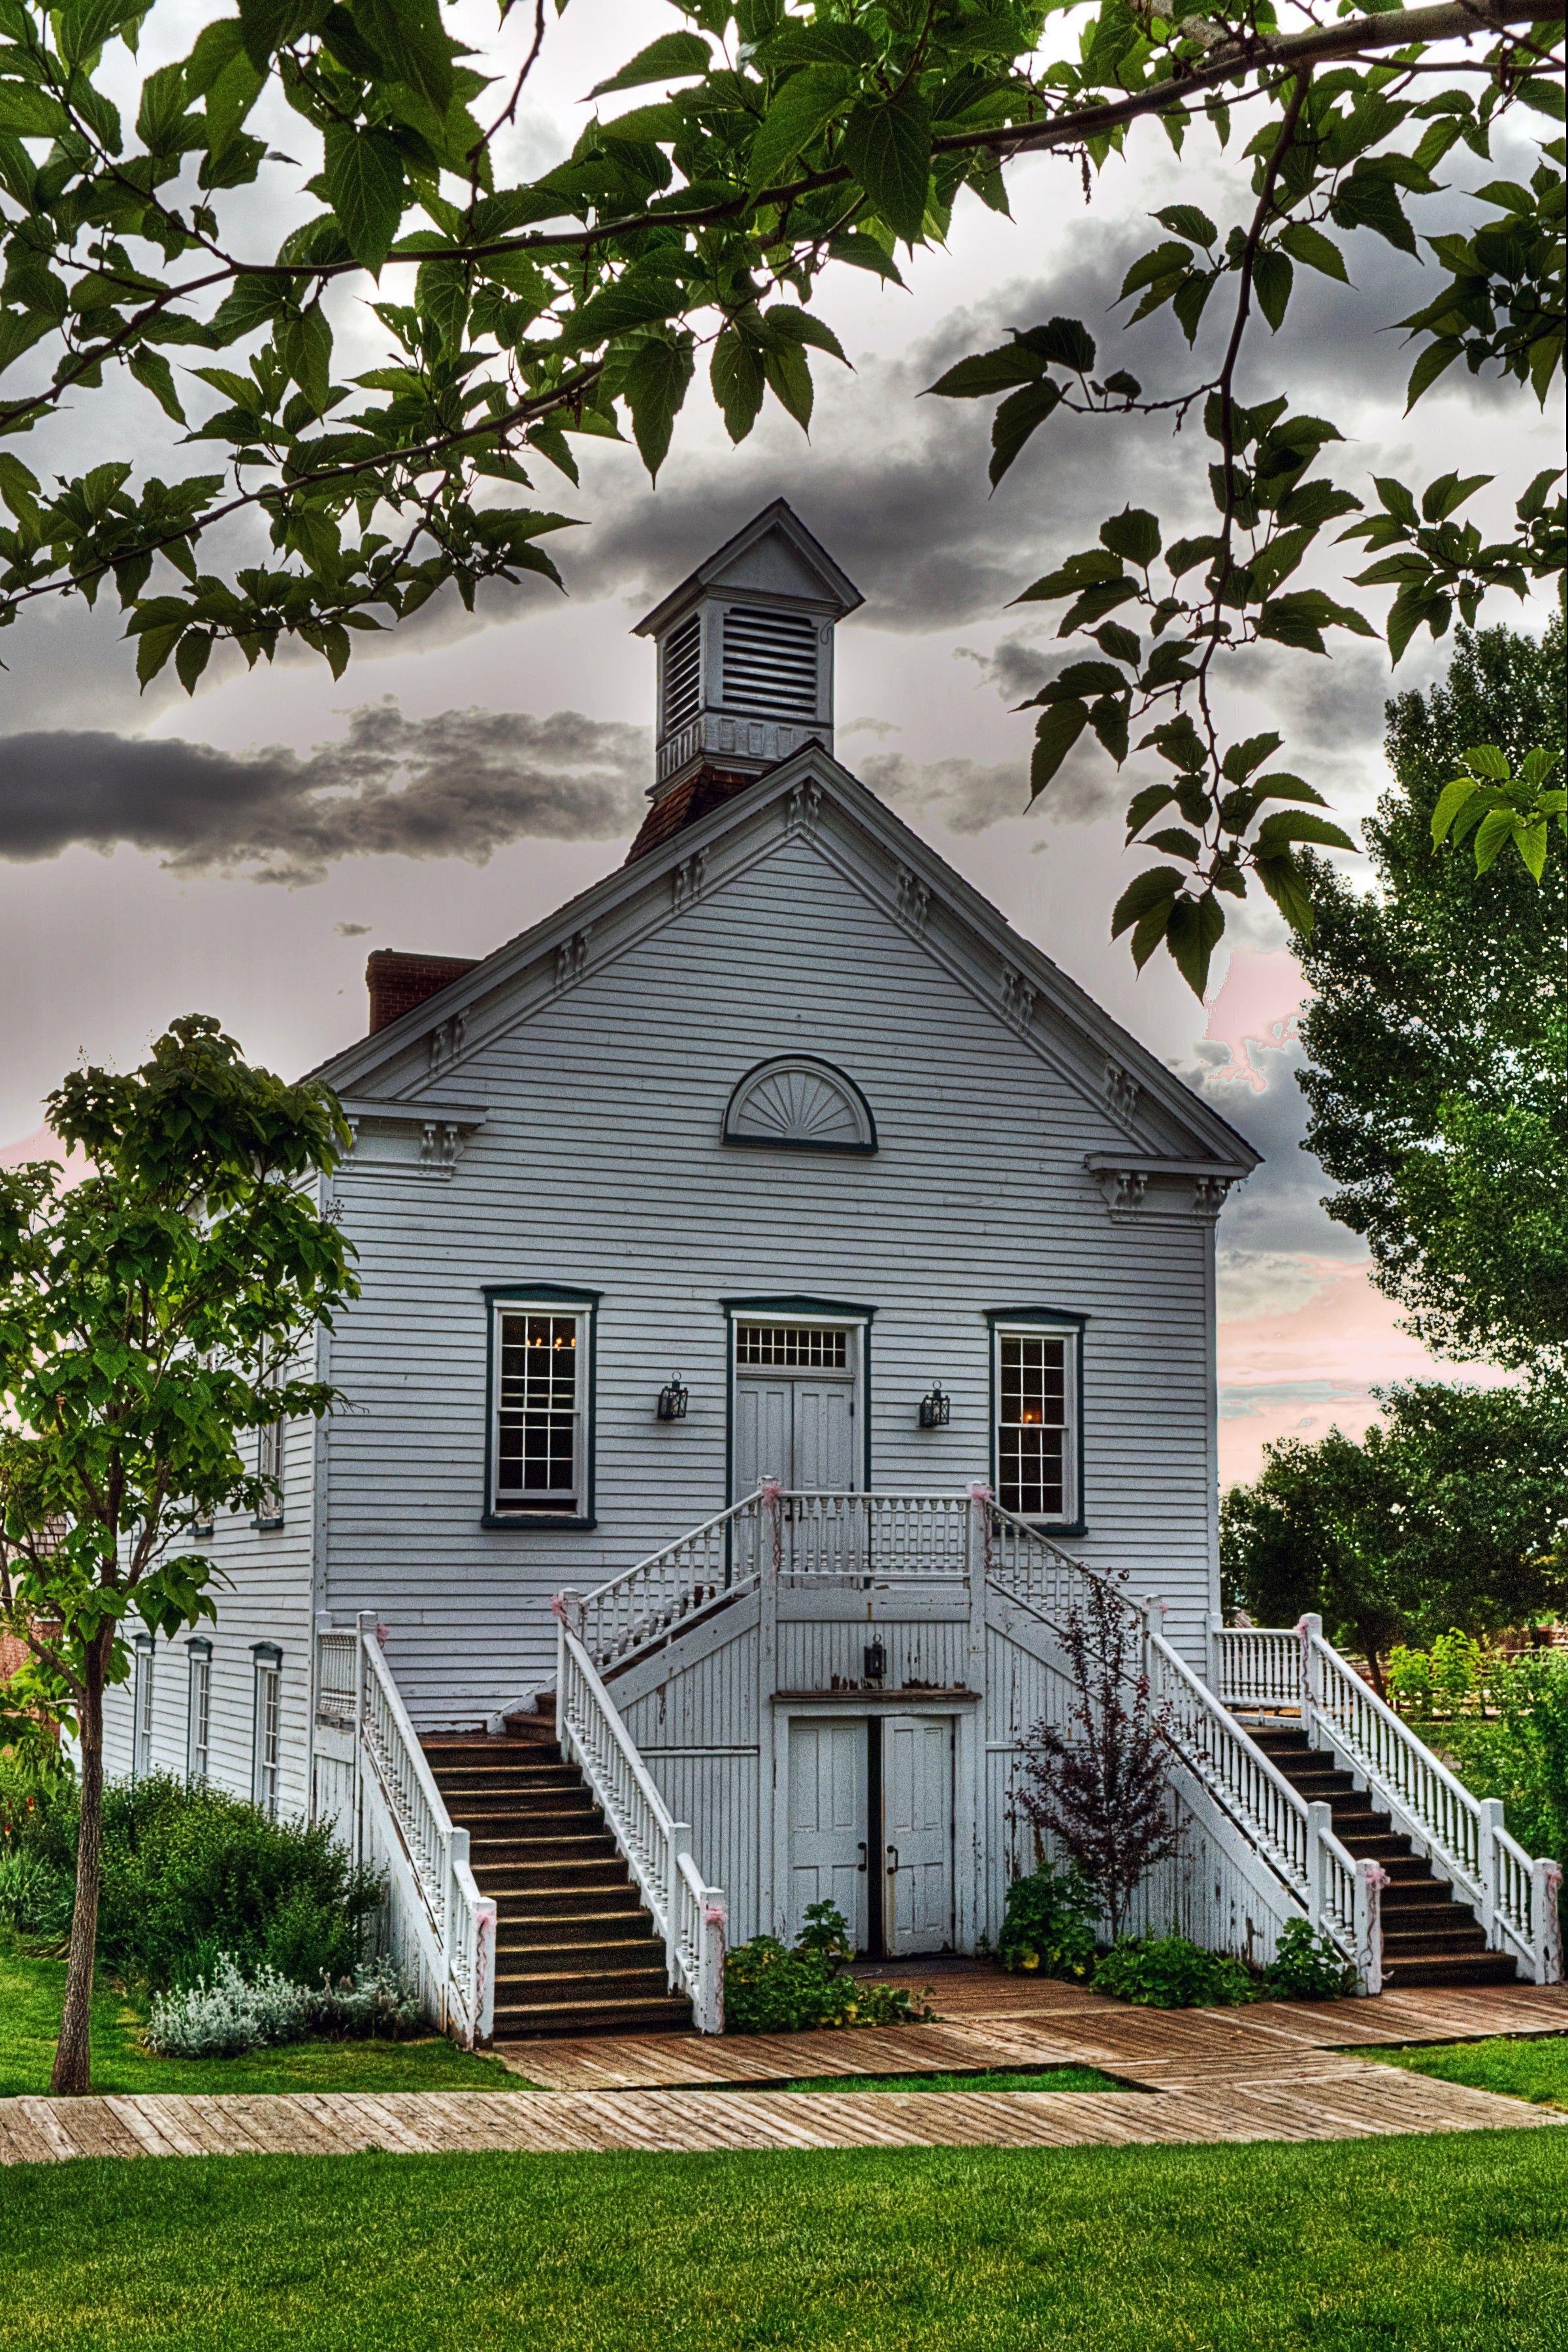 An old wooden chapel in Pine Valley, Utah.